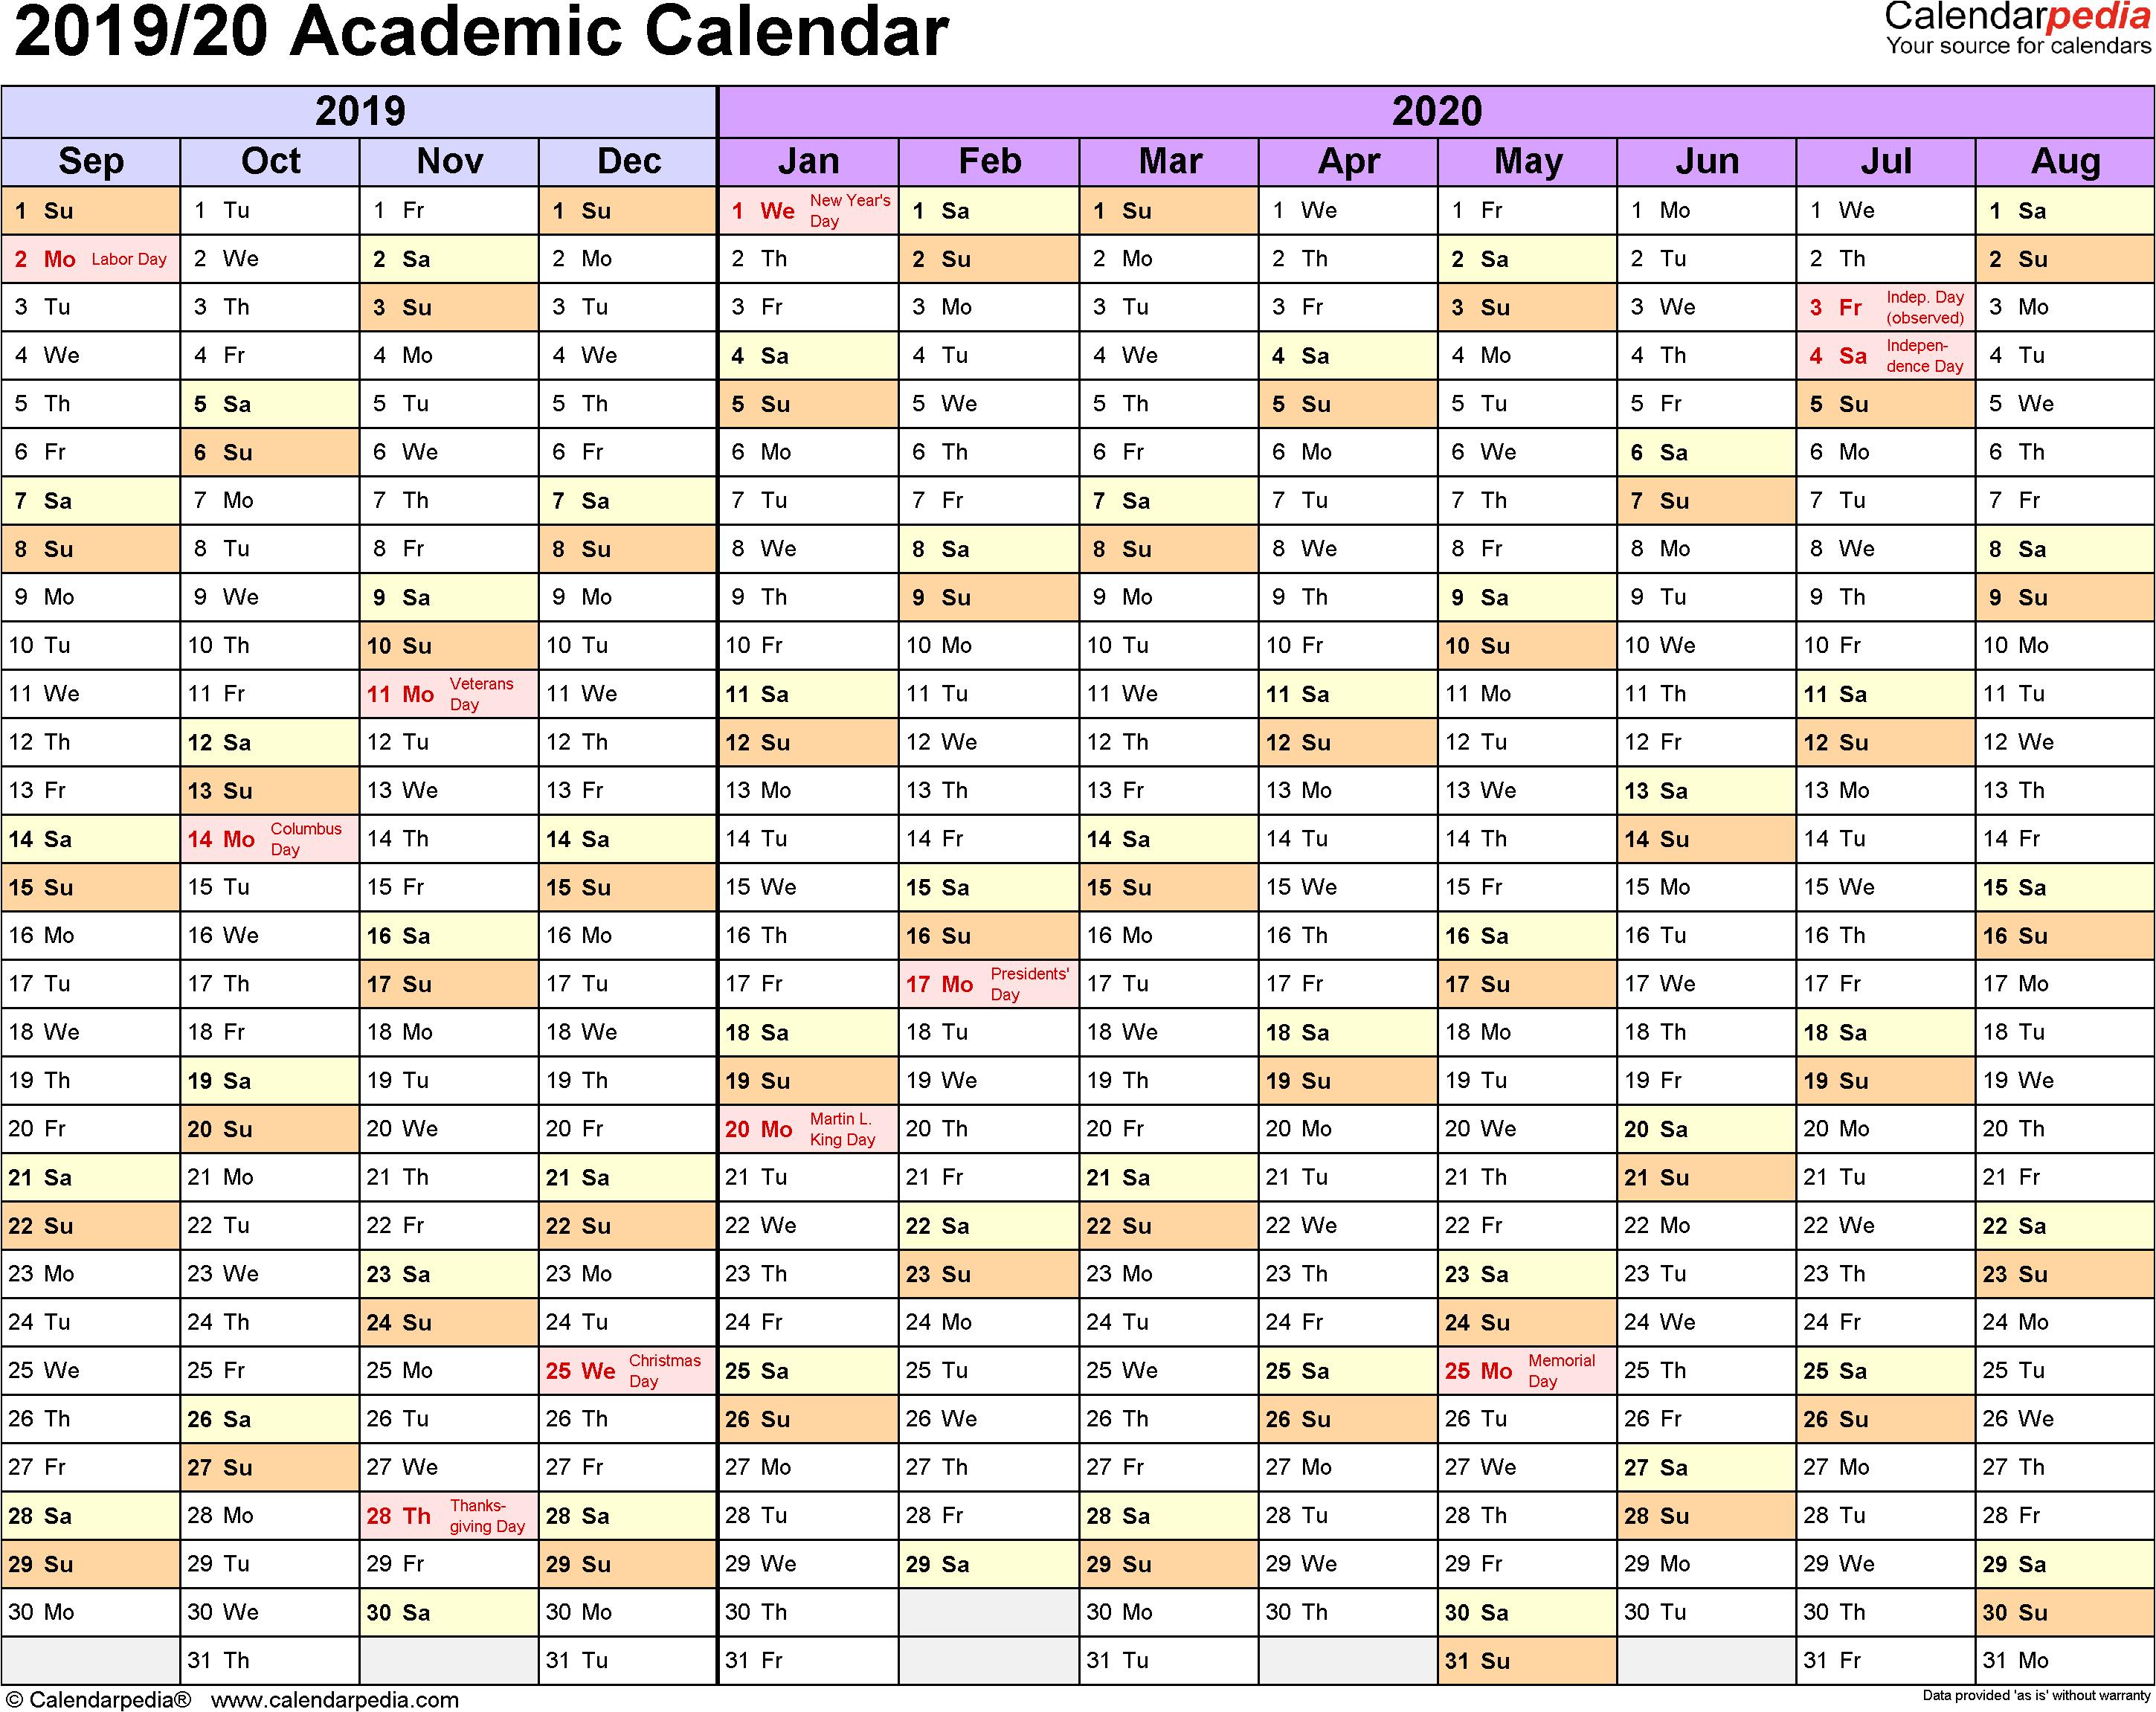 Print 59 Examples School Year Calendar 2019 2020 Template within Google Calendar Printable 2019 2020